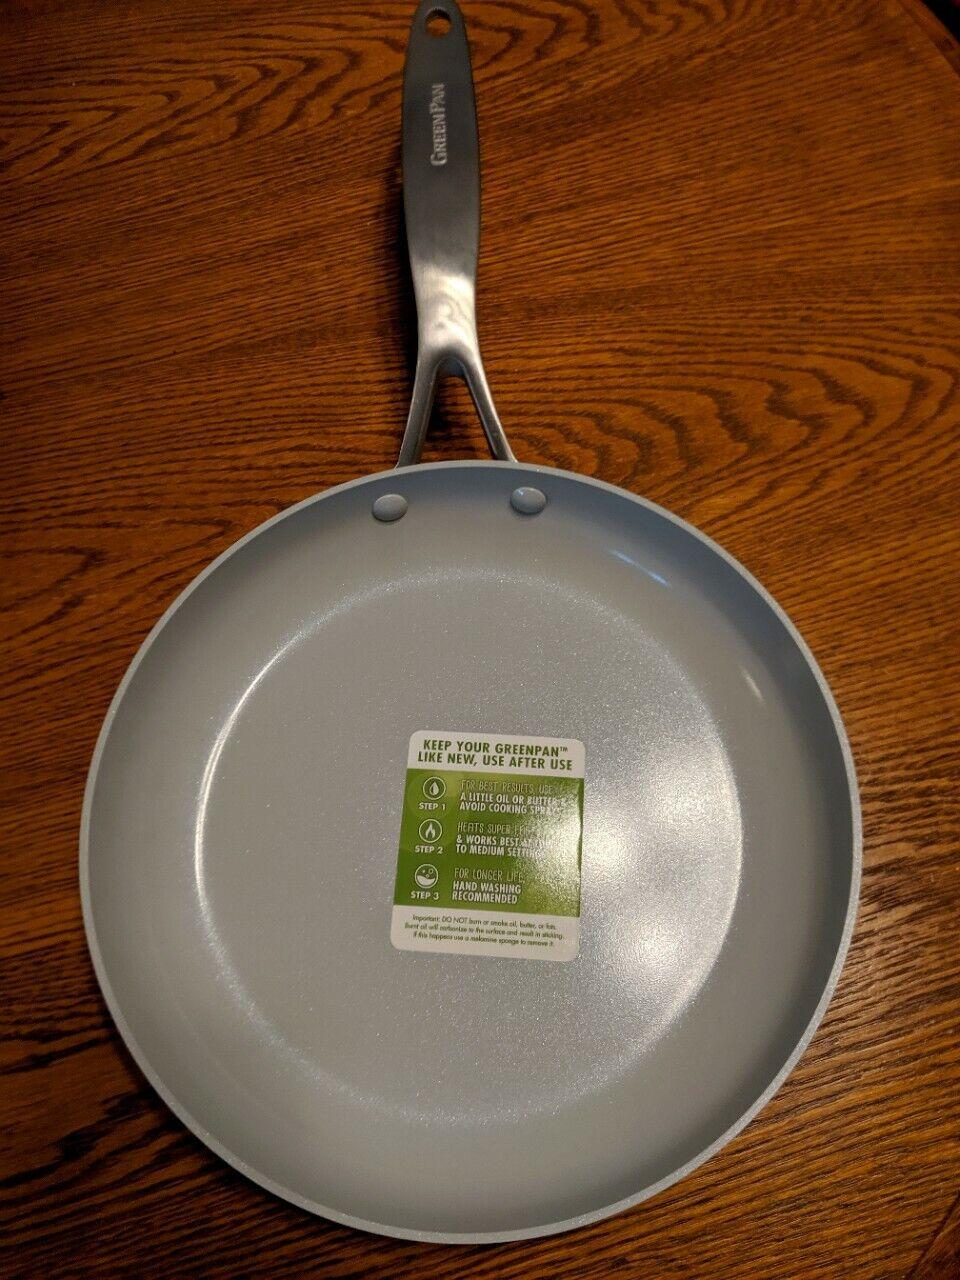 GreenPan Stainless Steel Venice Pro Ceramic Non-Stick Frypan